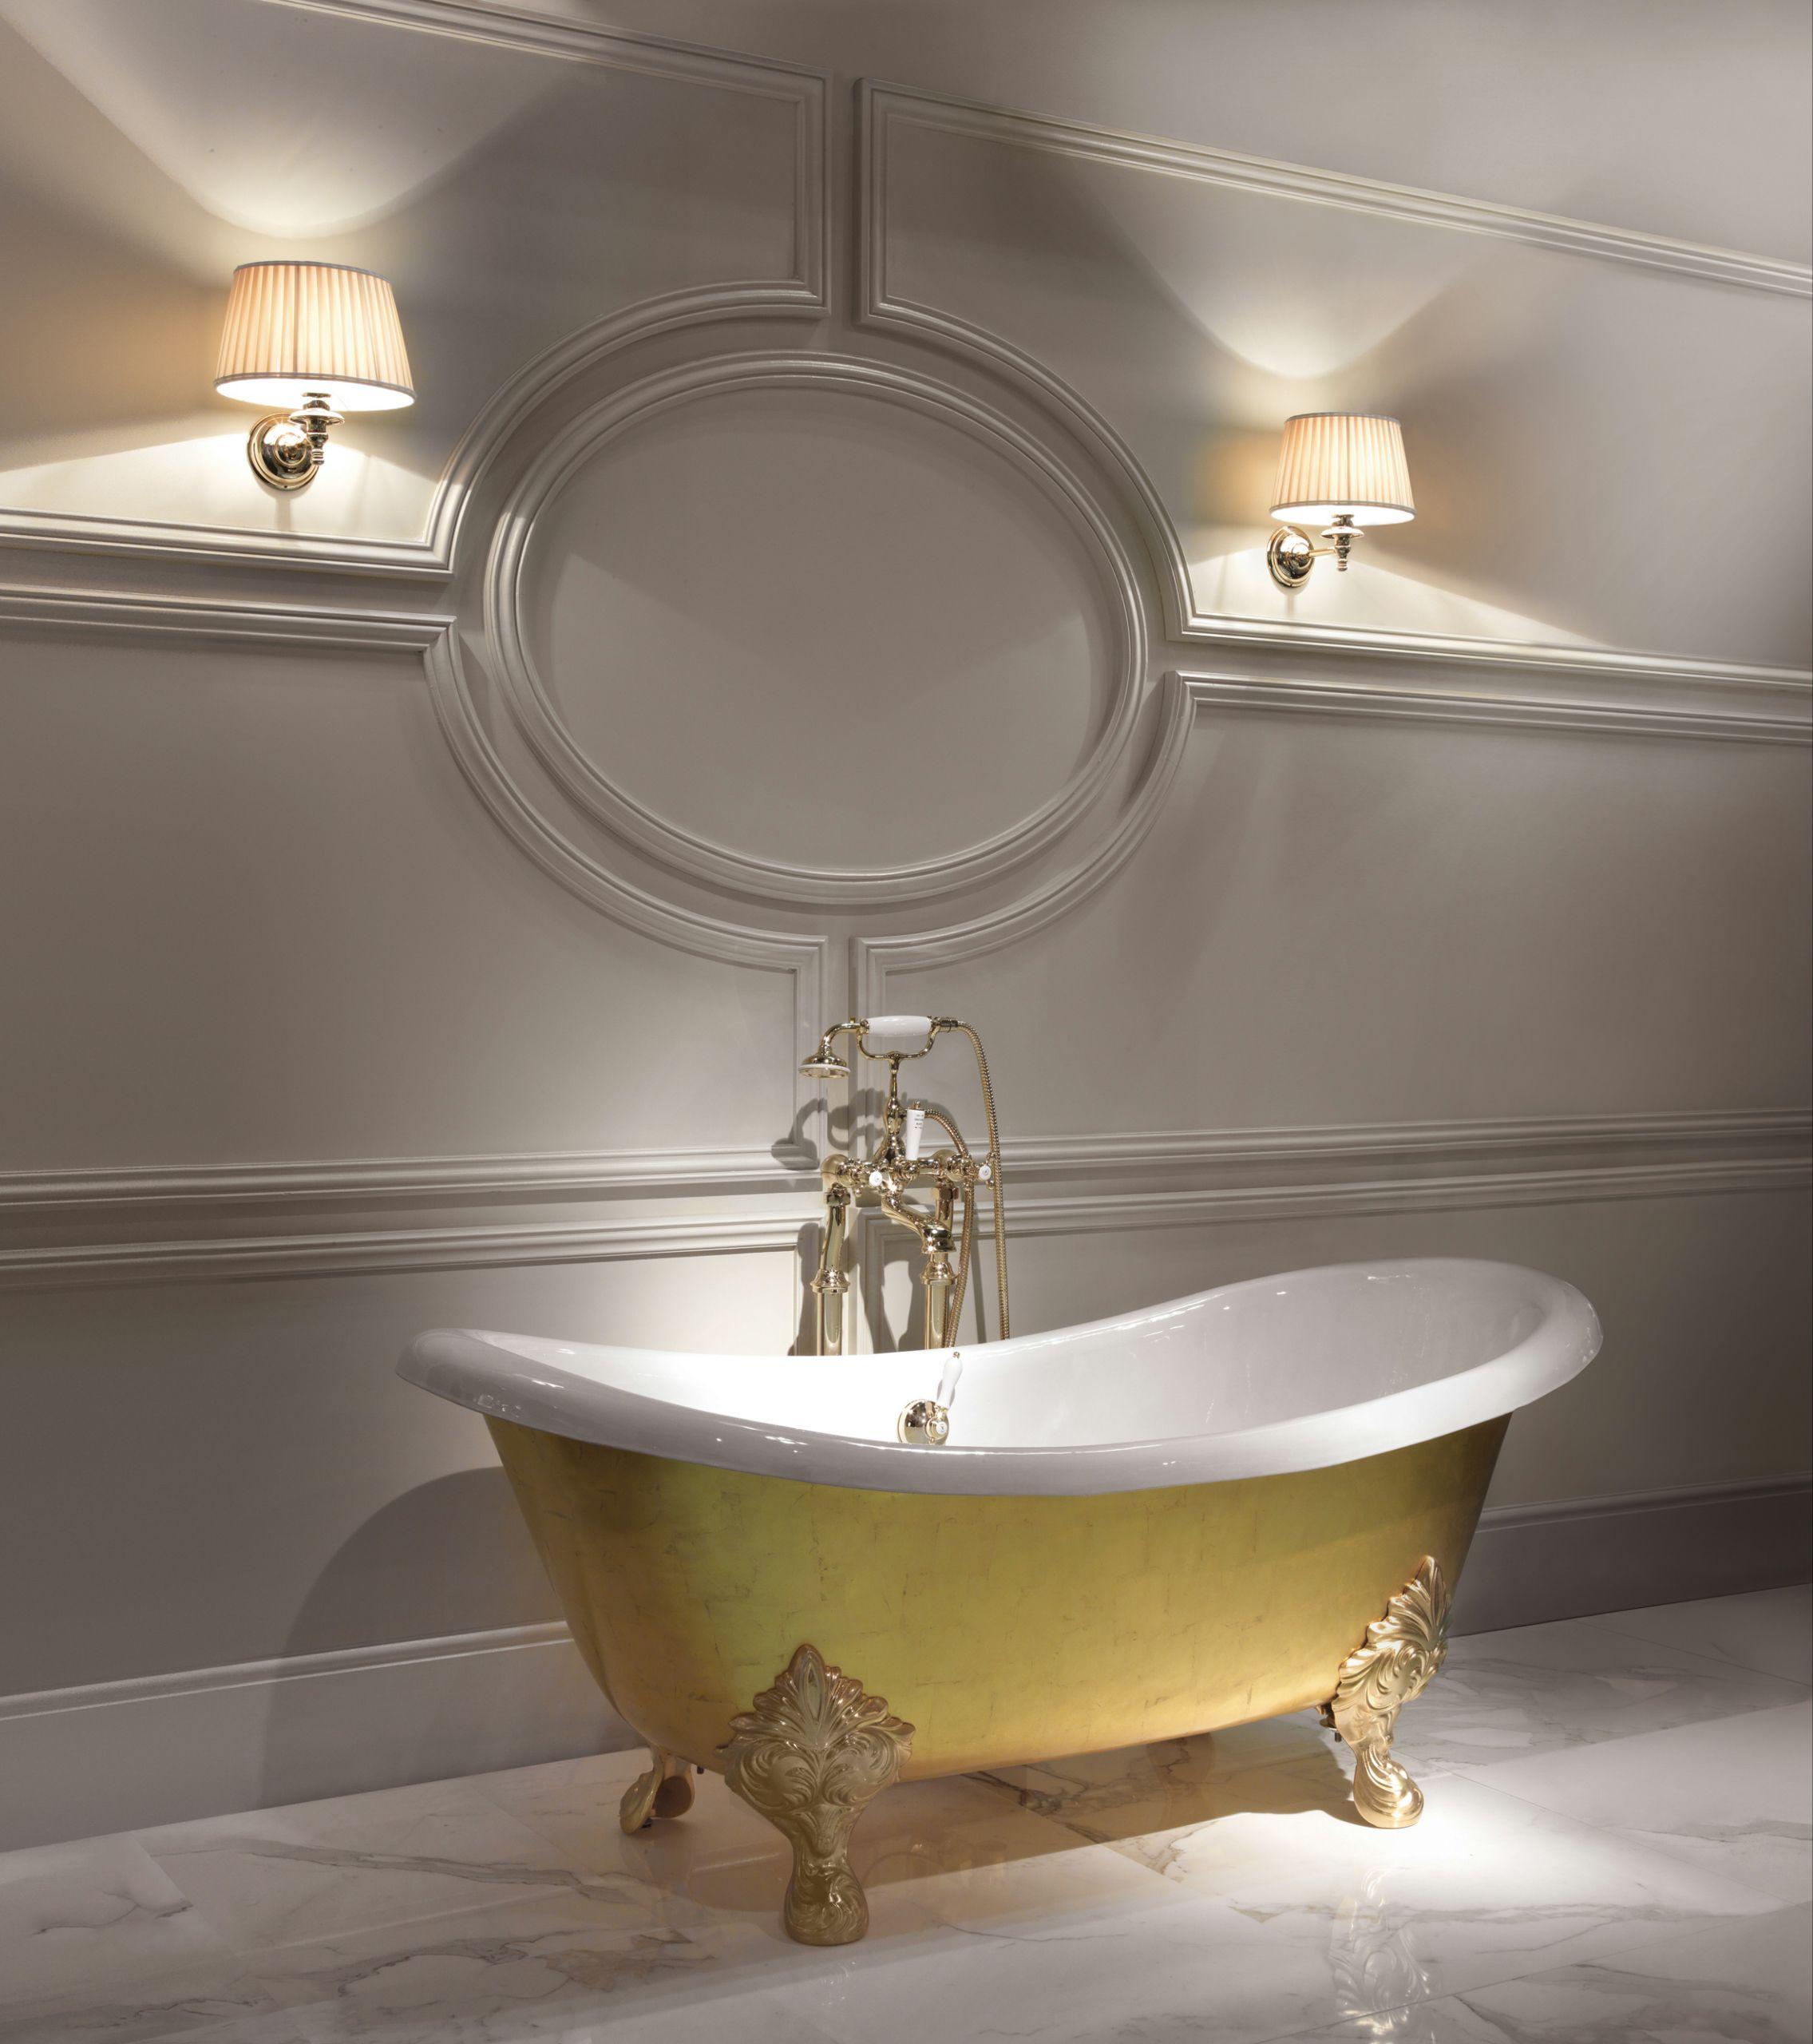 Gold leaf bathtub mida by devon devon - Bagno devon e devon ...